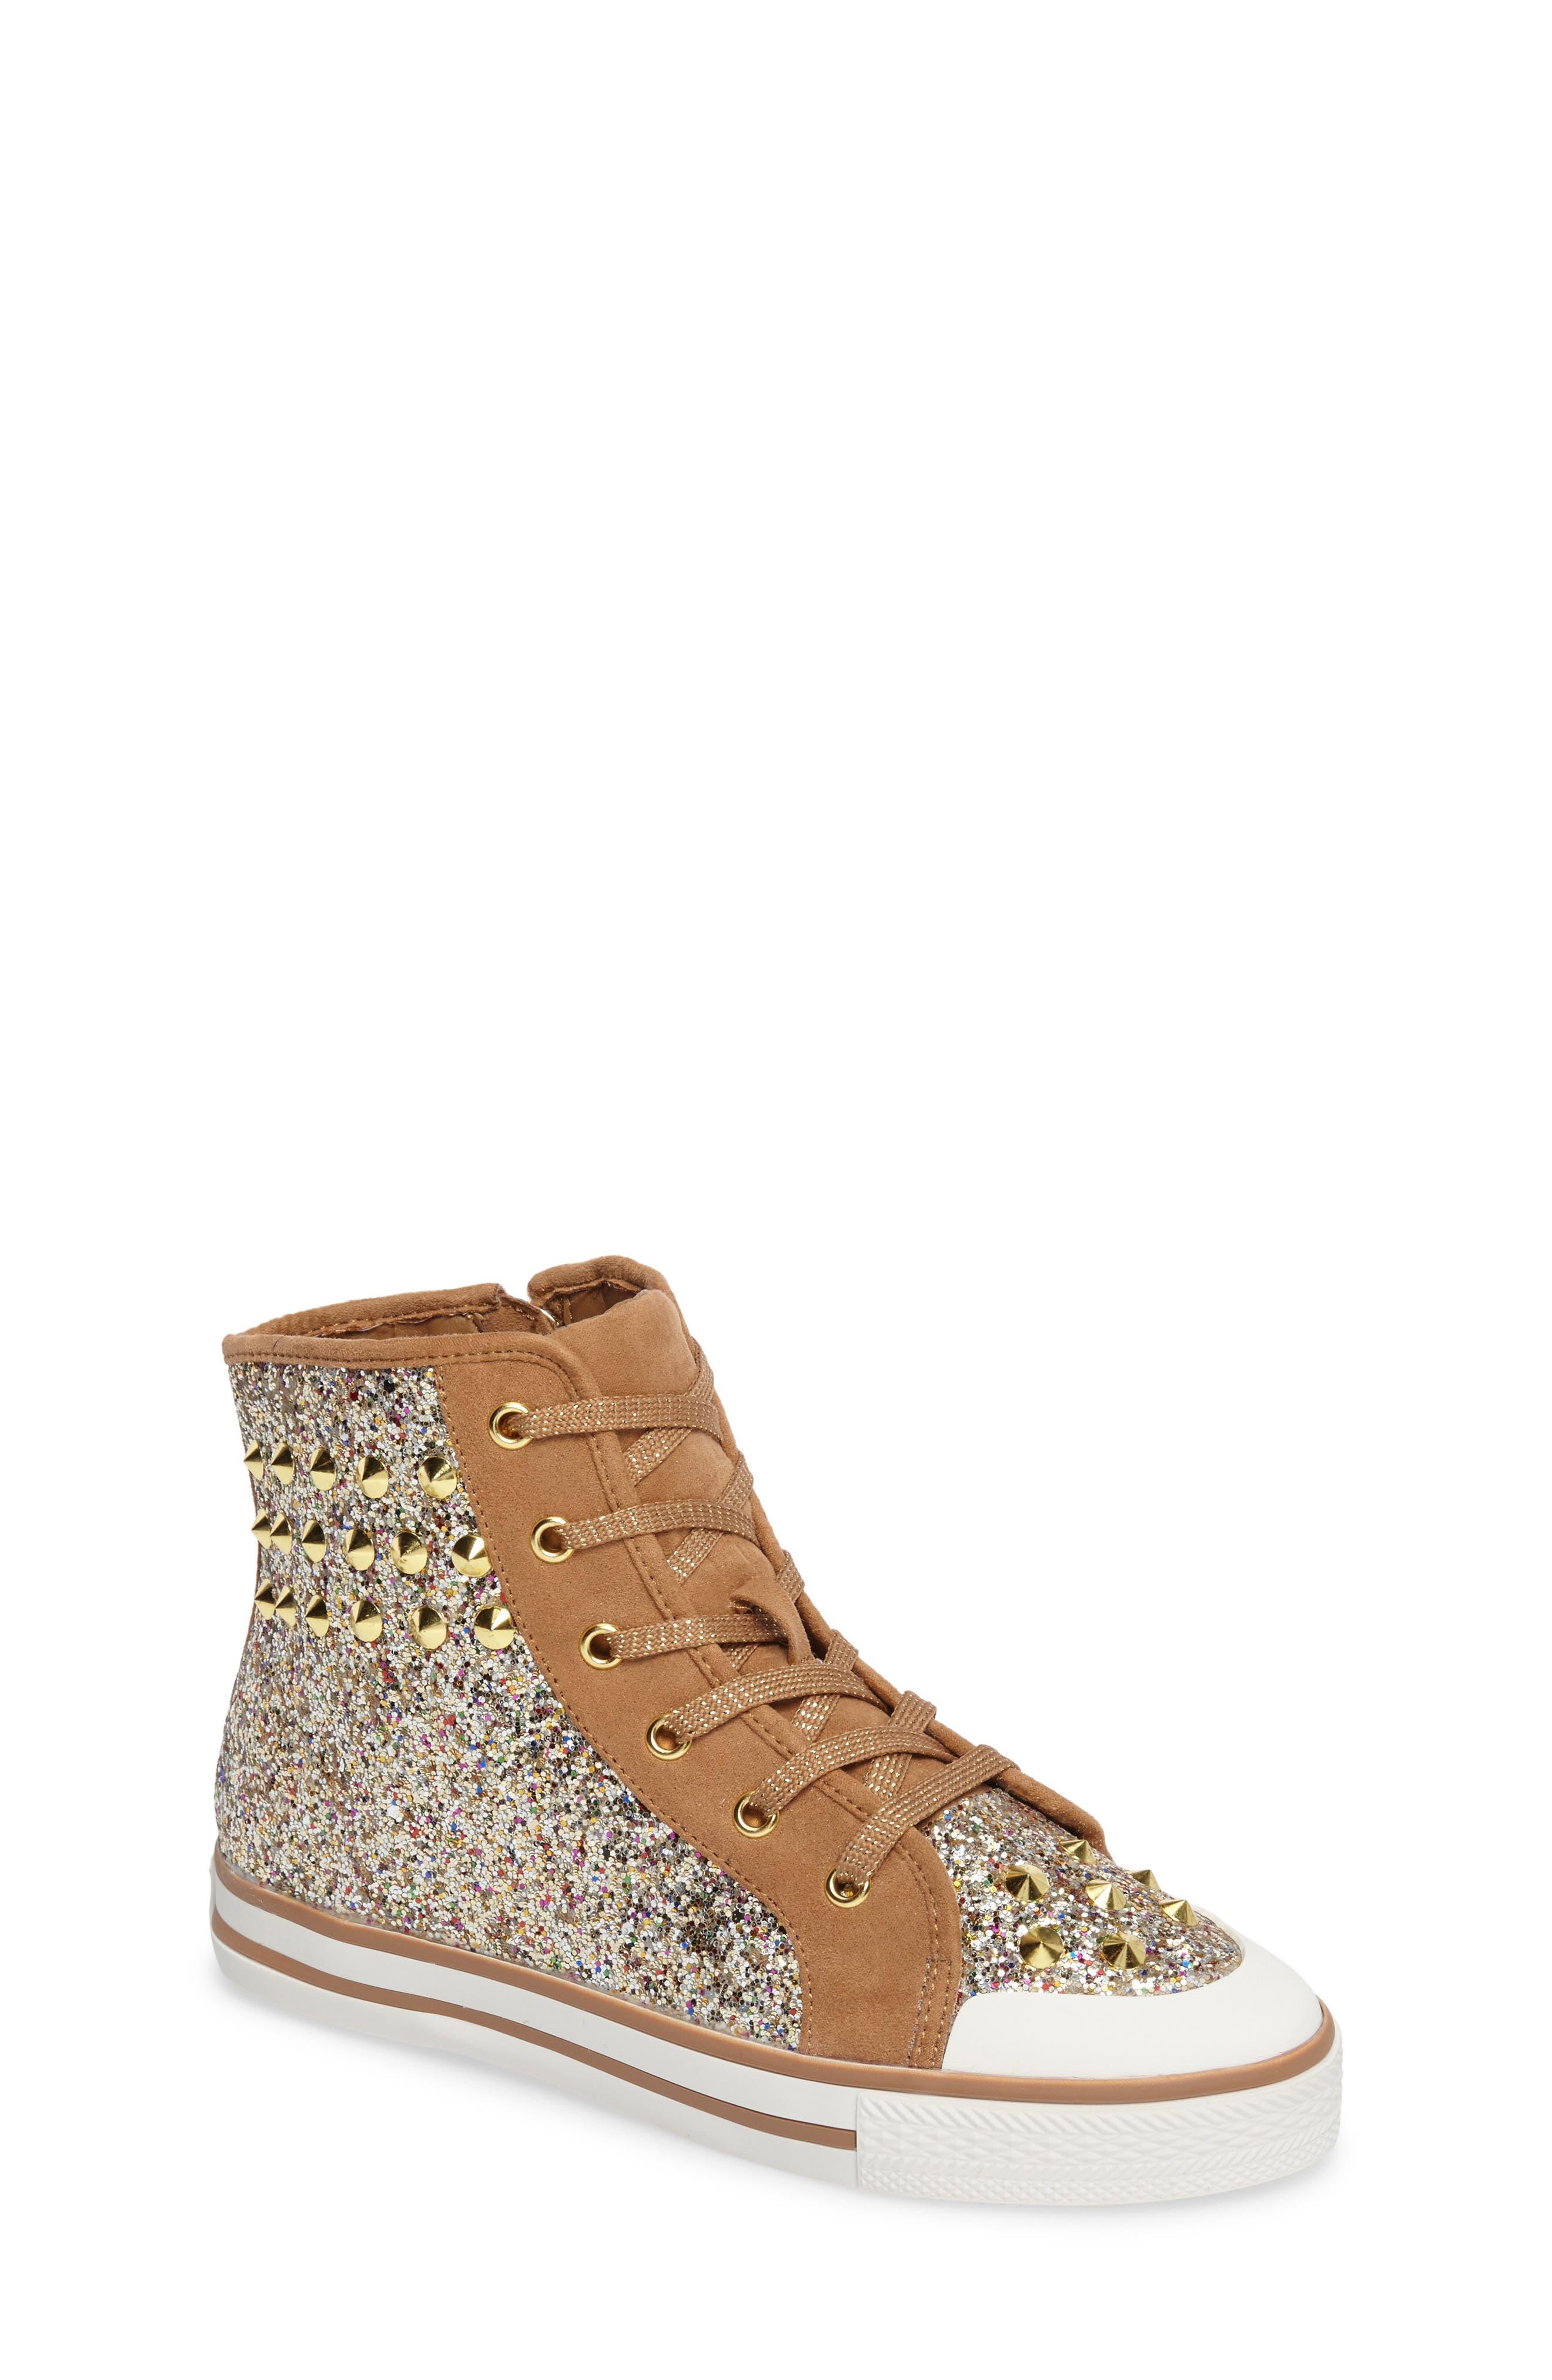 Main Image - Ash Lita Roe Glittery High Top Sneaker (Toddler, Little Kid & Big Kid)